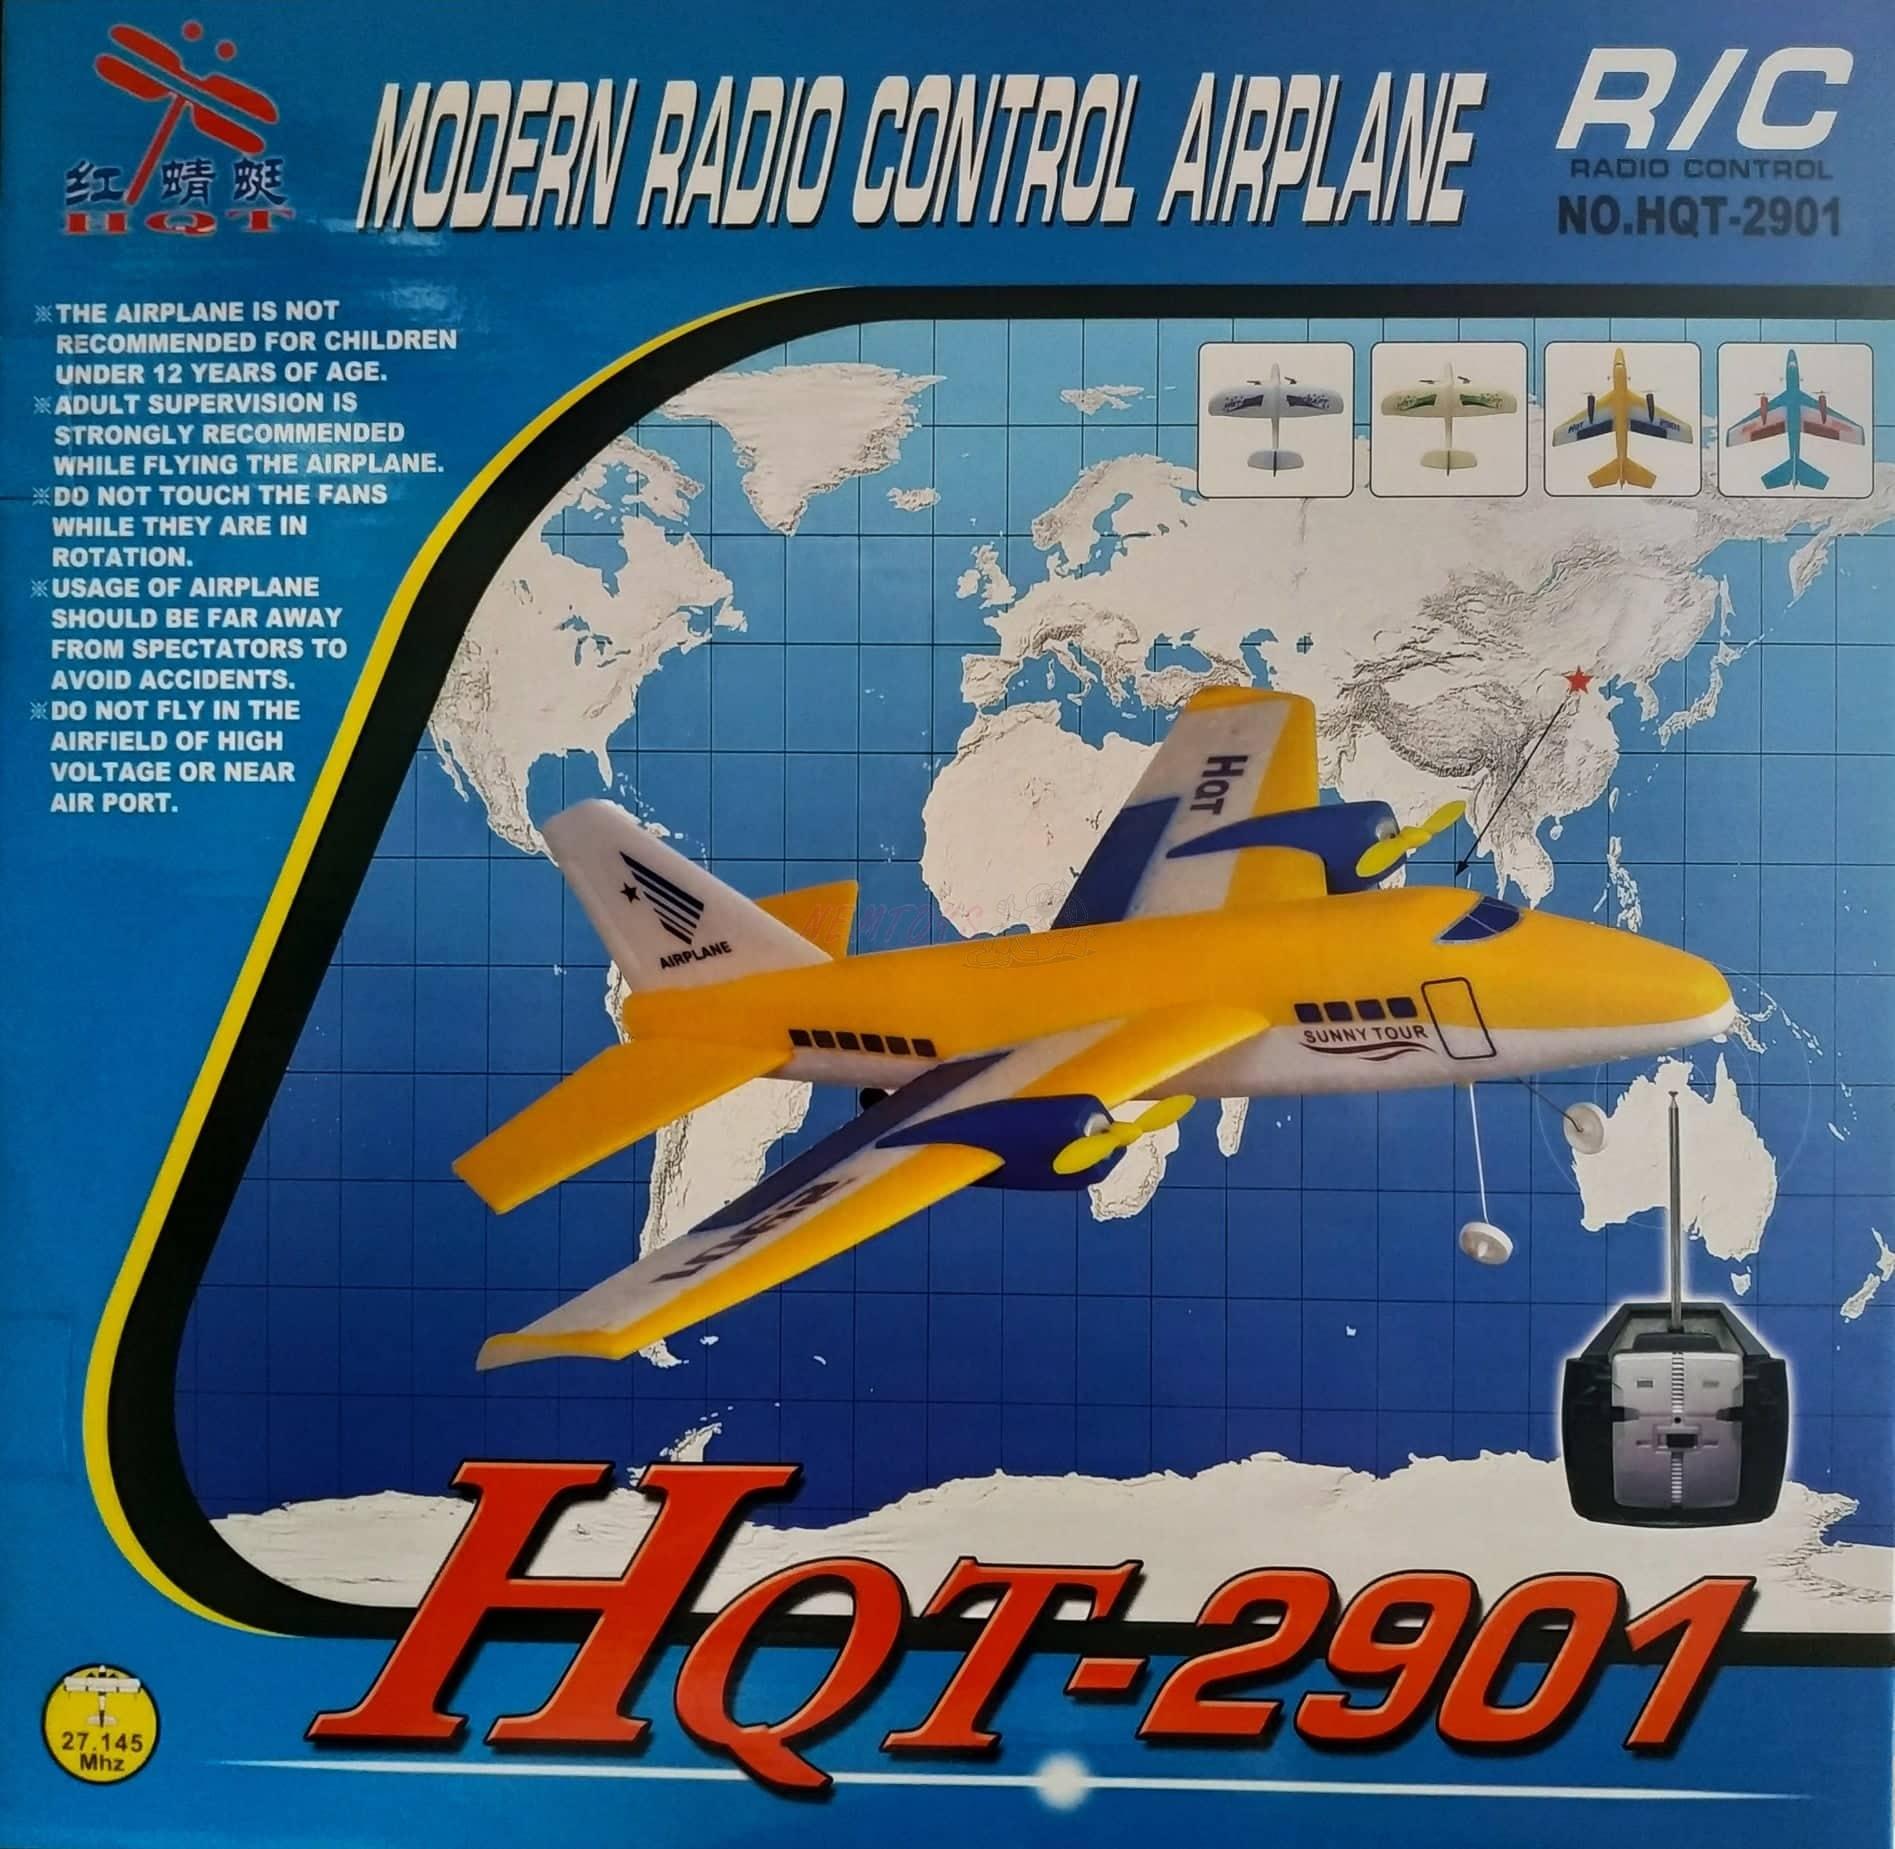 R/C LETADLO HQT-2901